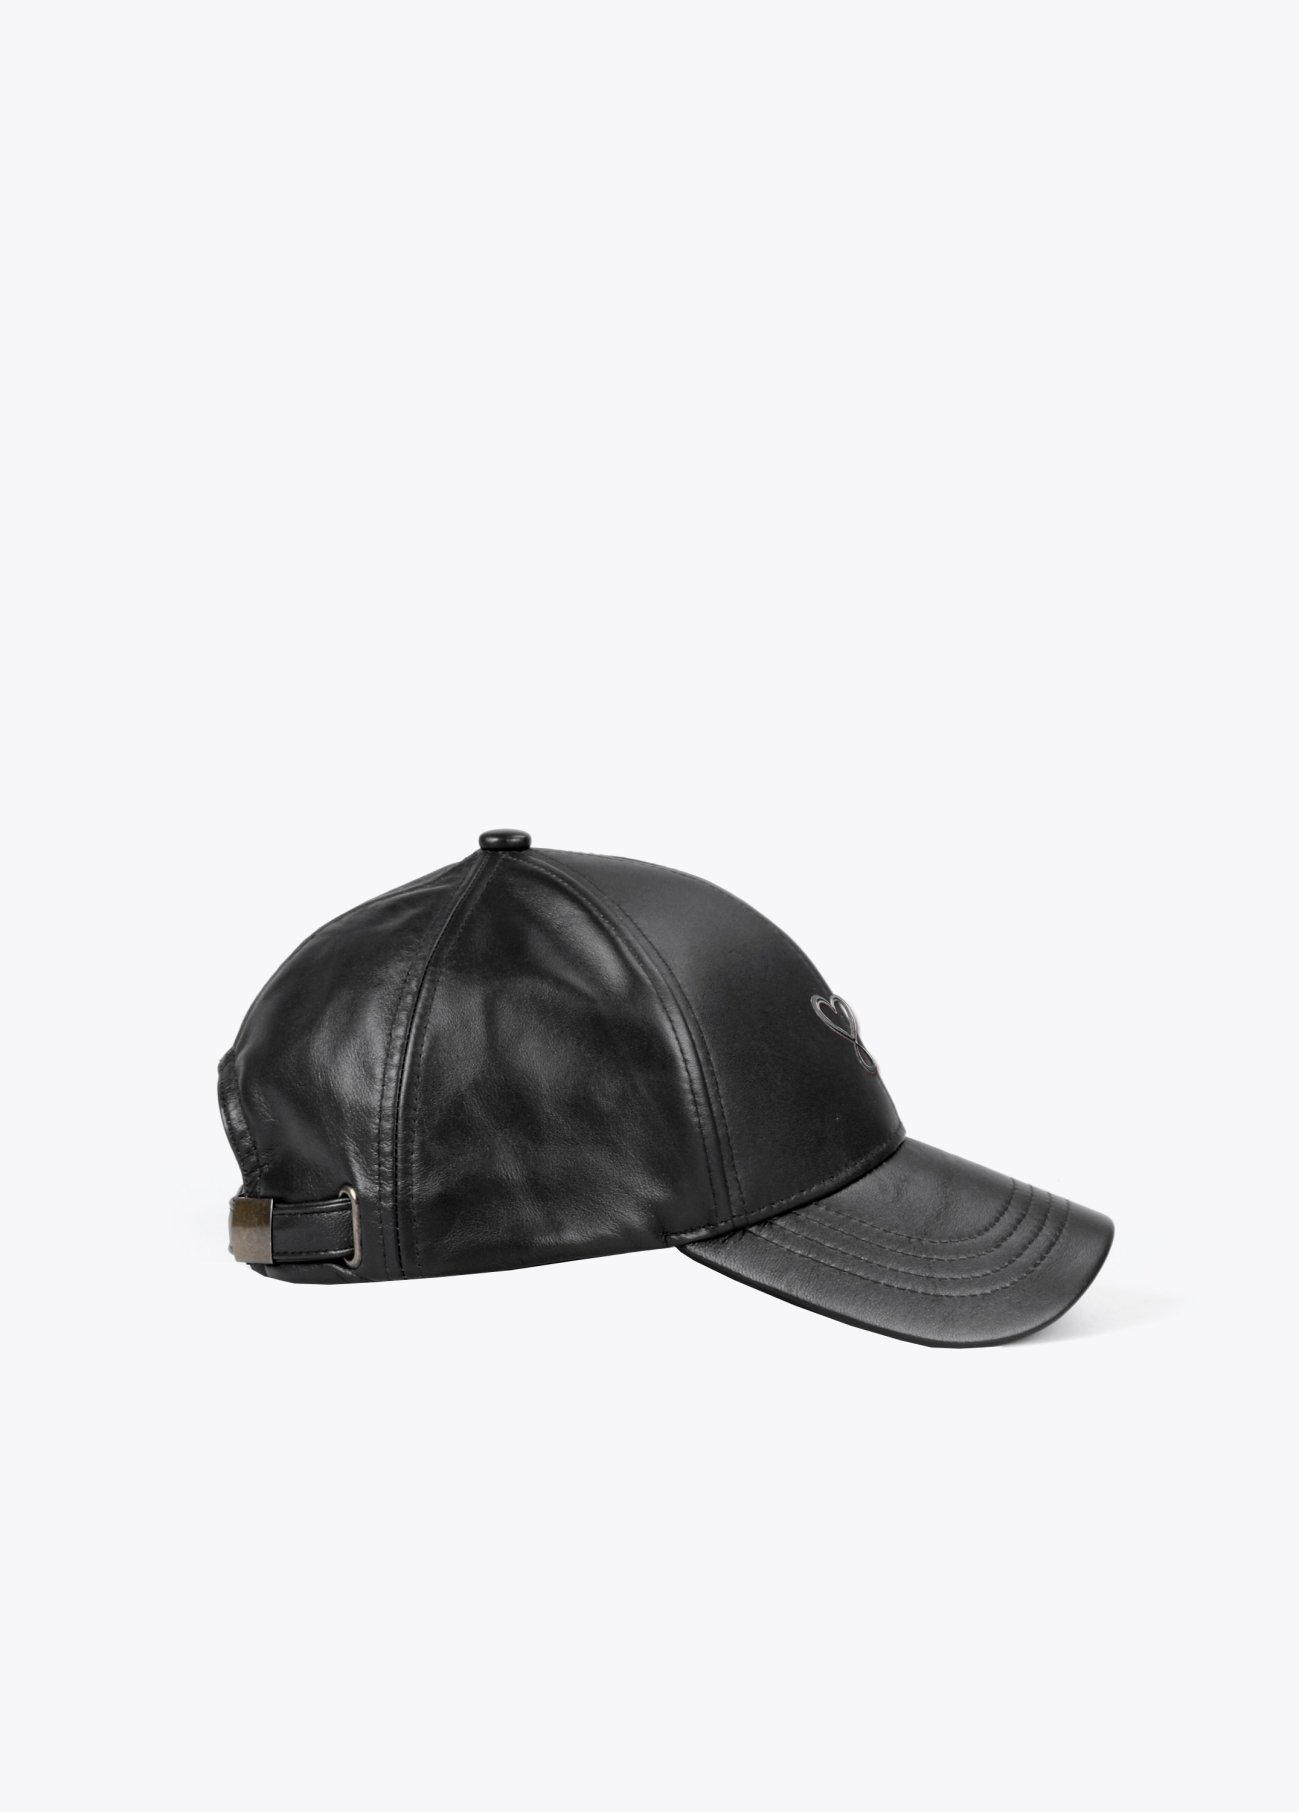 Gorra basics de ecopiel, rojo, negro 2